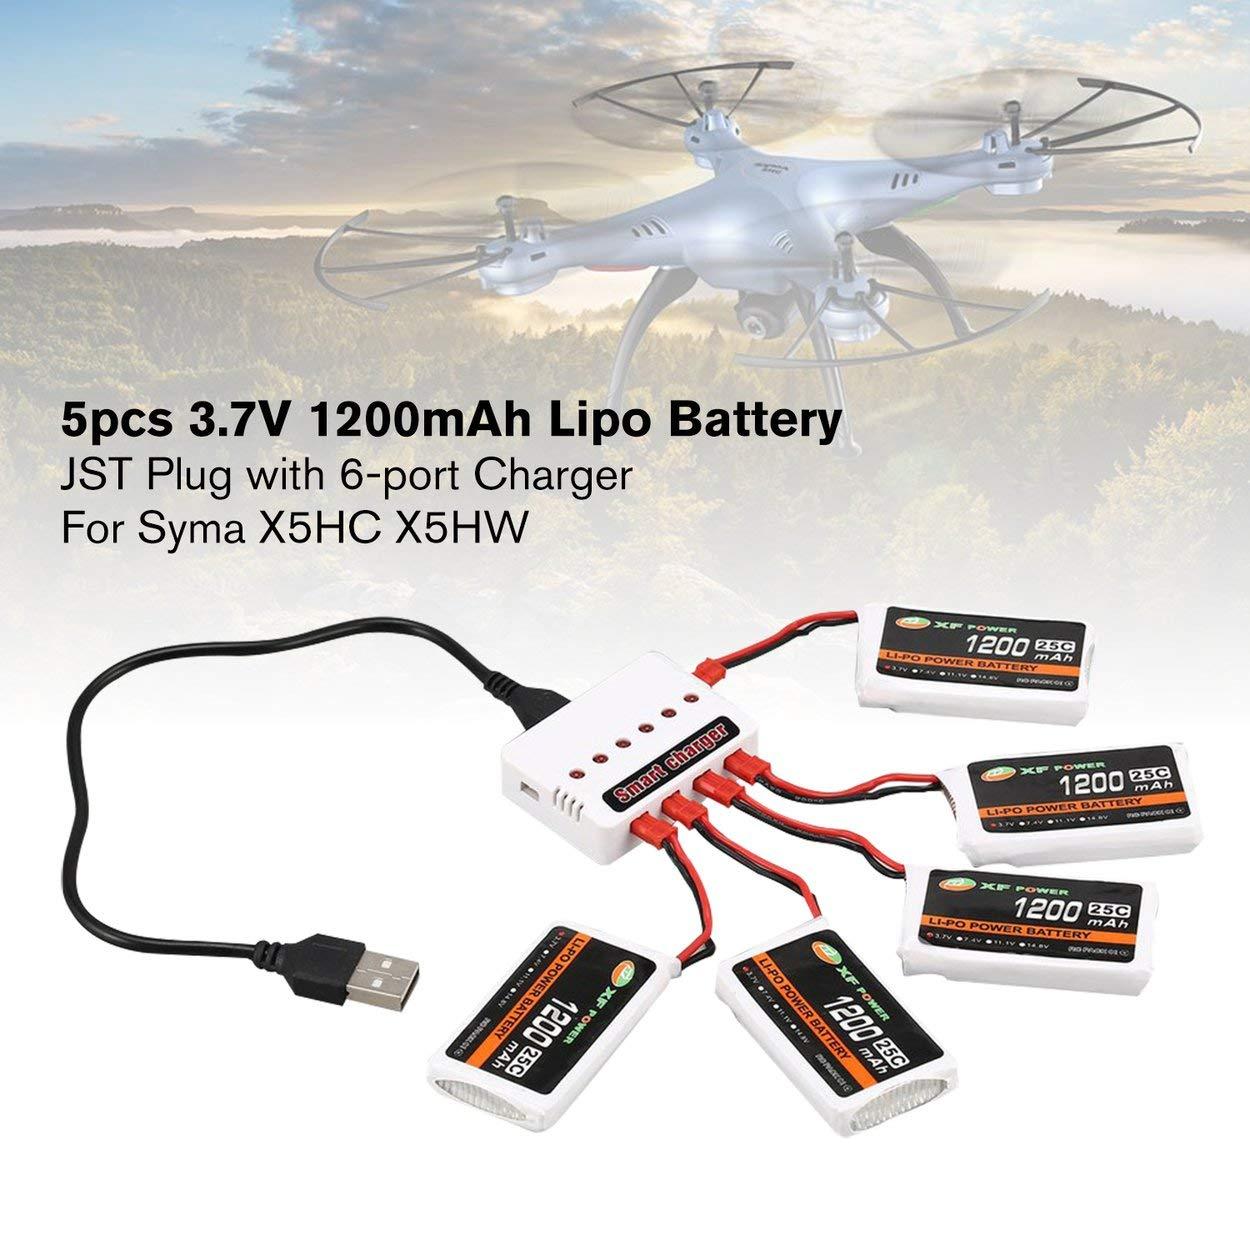 Relabouting 5pcs XF Power 3.7V 1200mAh 25C Lipo Batería JST Plug ...